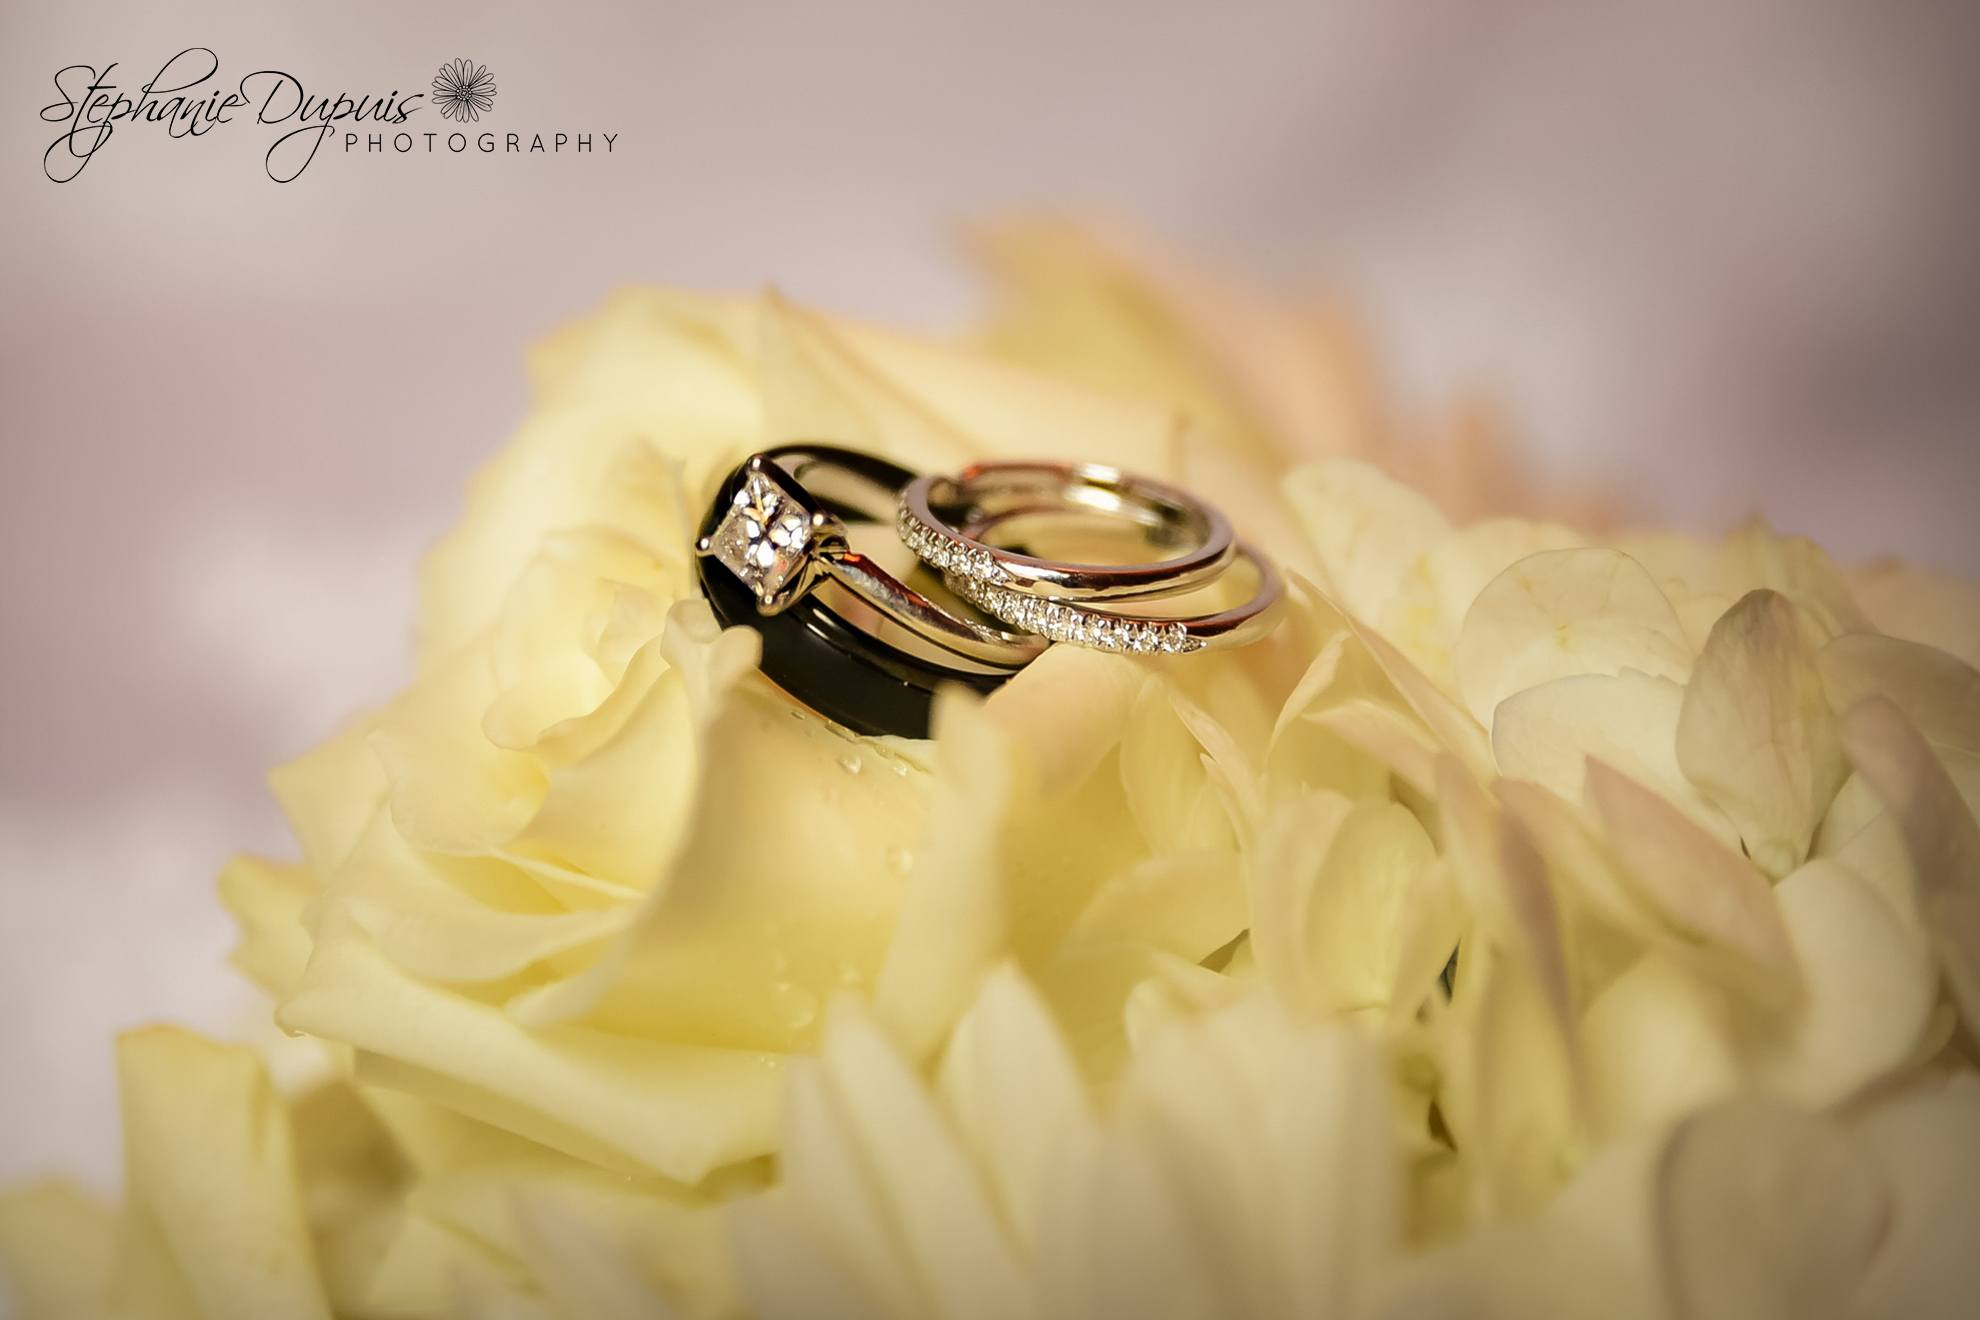 Littleton Wedding Photographer 02 5 - Portfolio: Nason Wedding